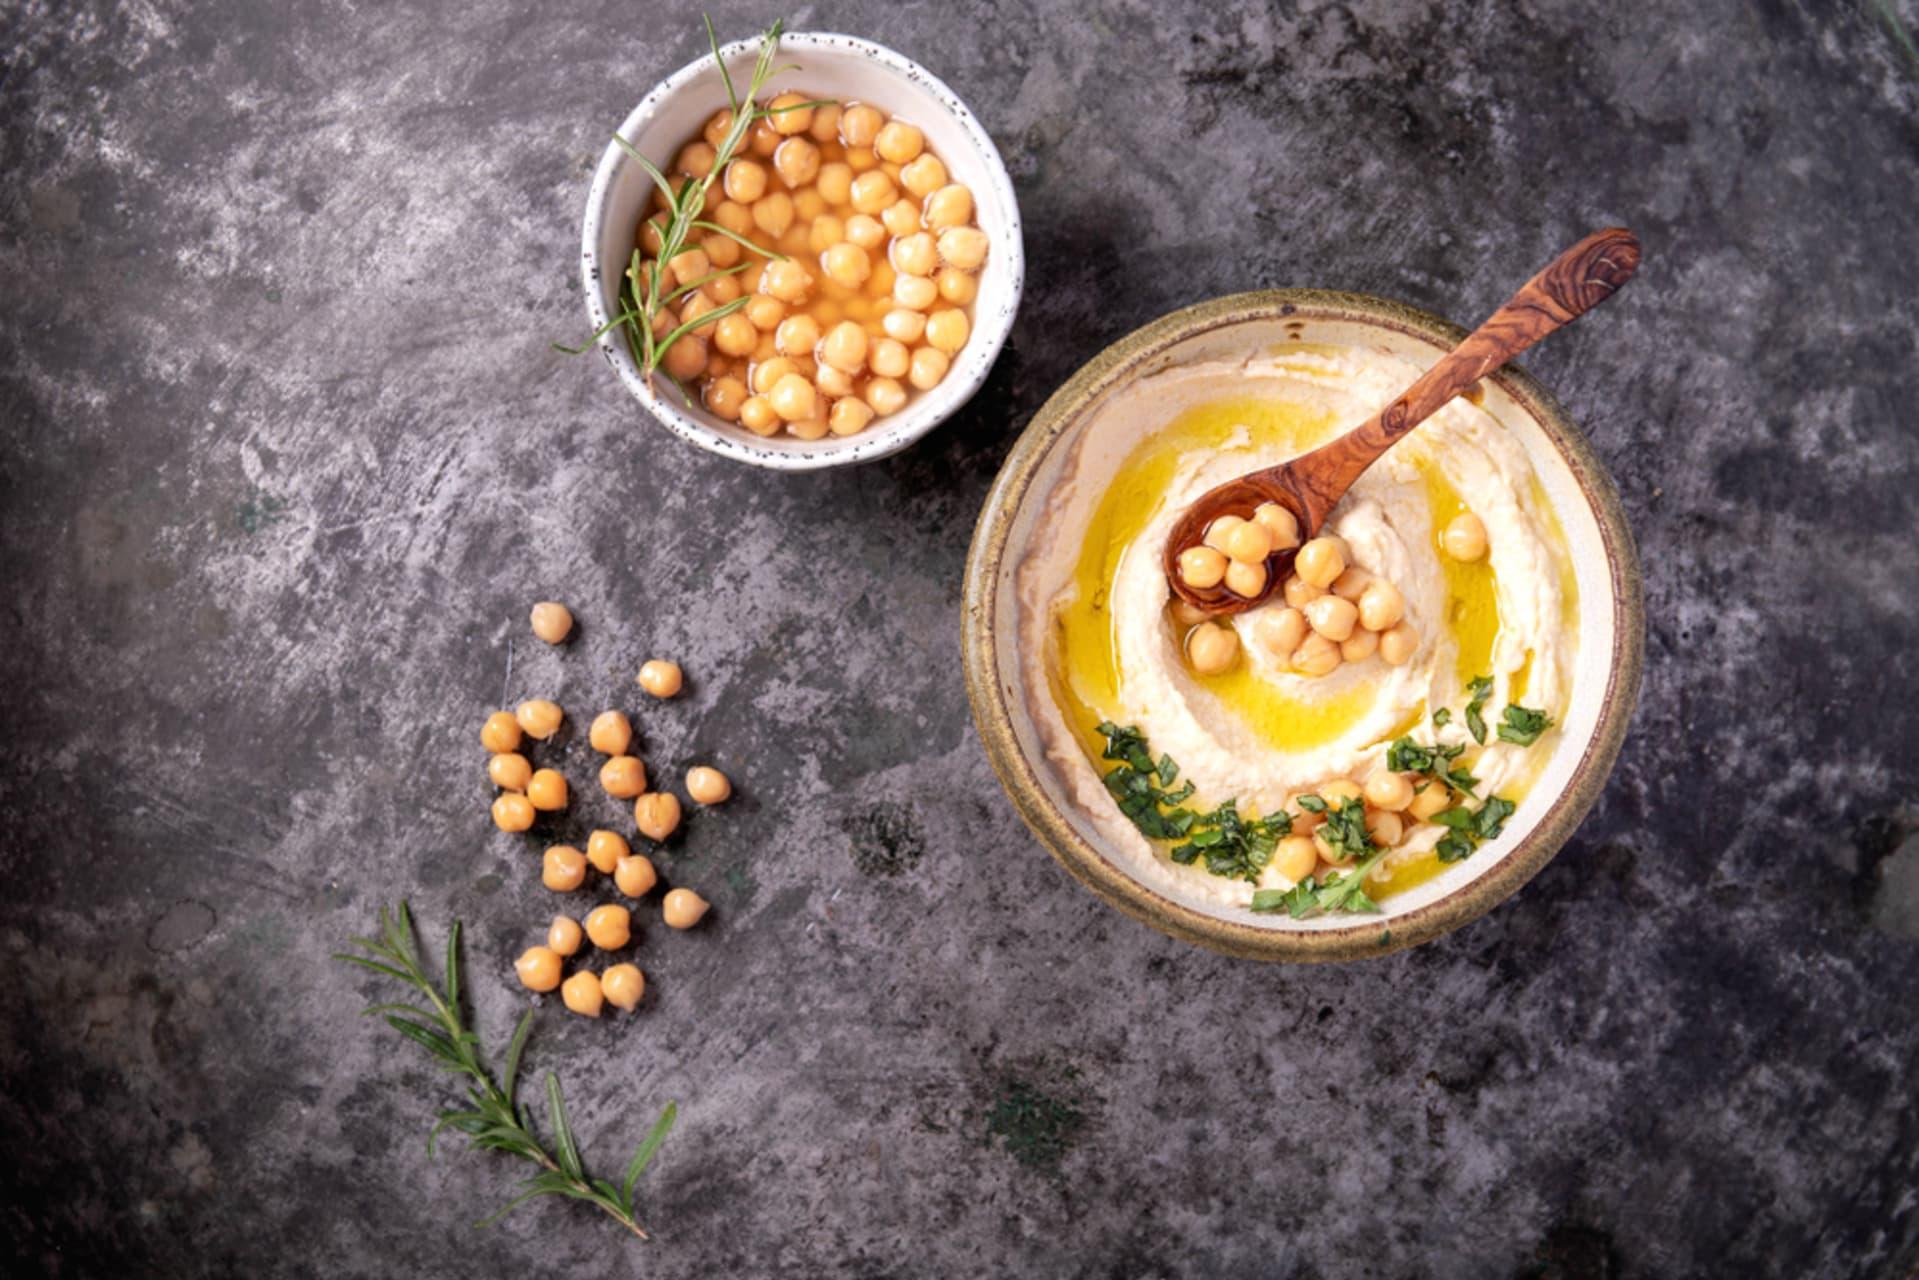 Haifa - Israeli cuisine and a dozen ways to make Humus